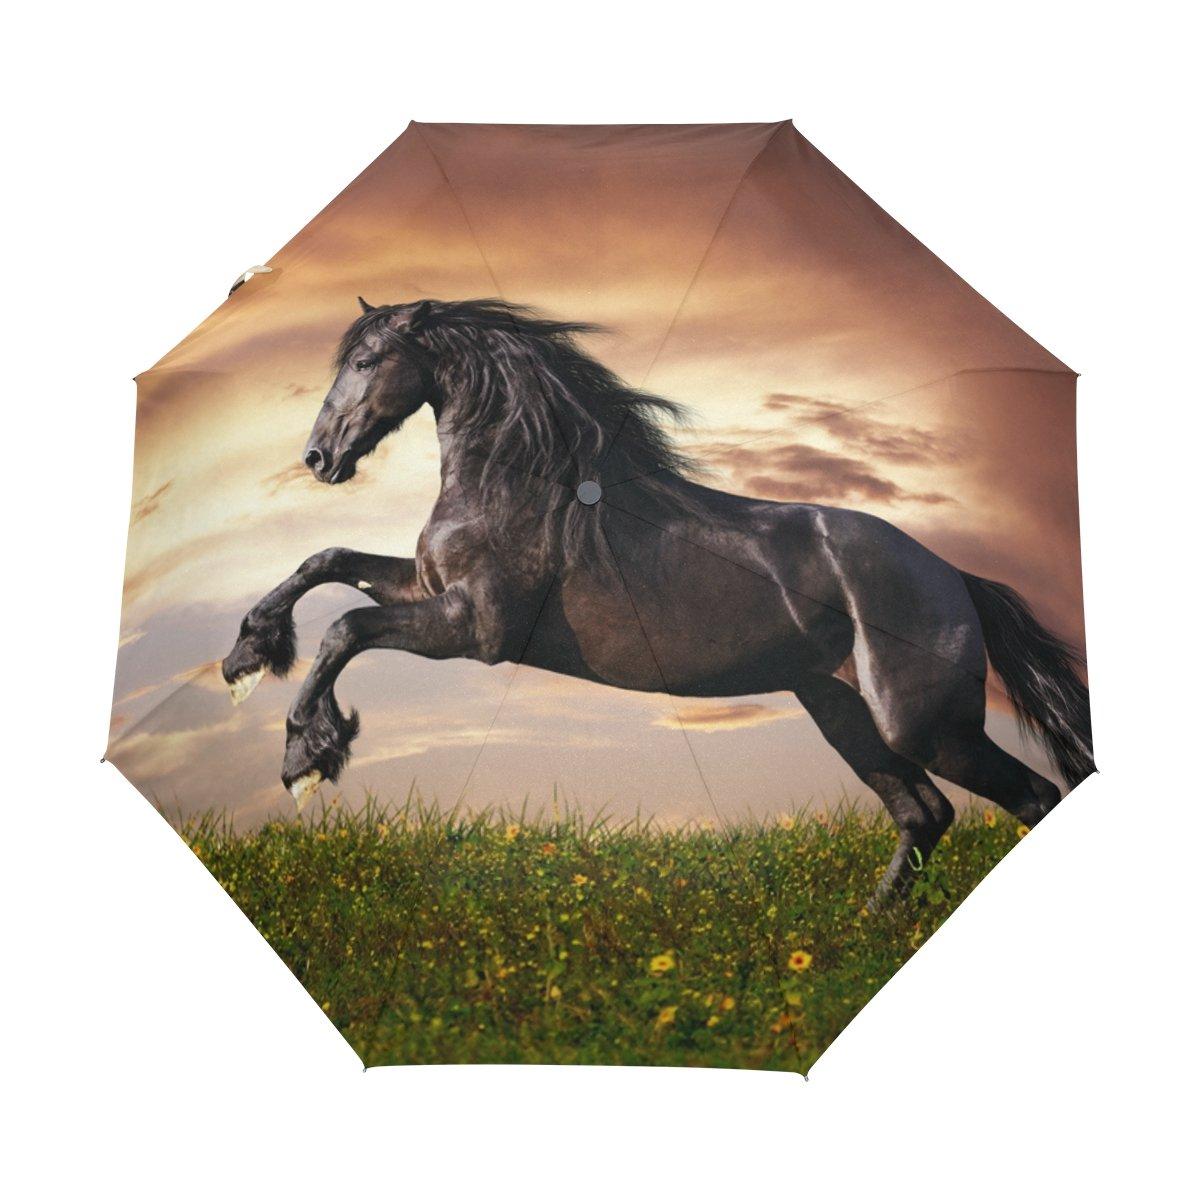 deyyaブラックFriesian Horse Gallop防風旅行傘自動的に開く閉じる軽量コンパクトゴルフ傘 B075GQTQGS